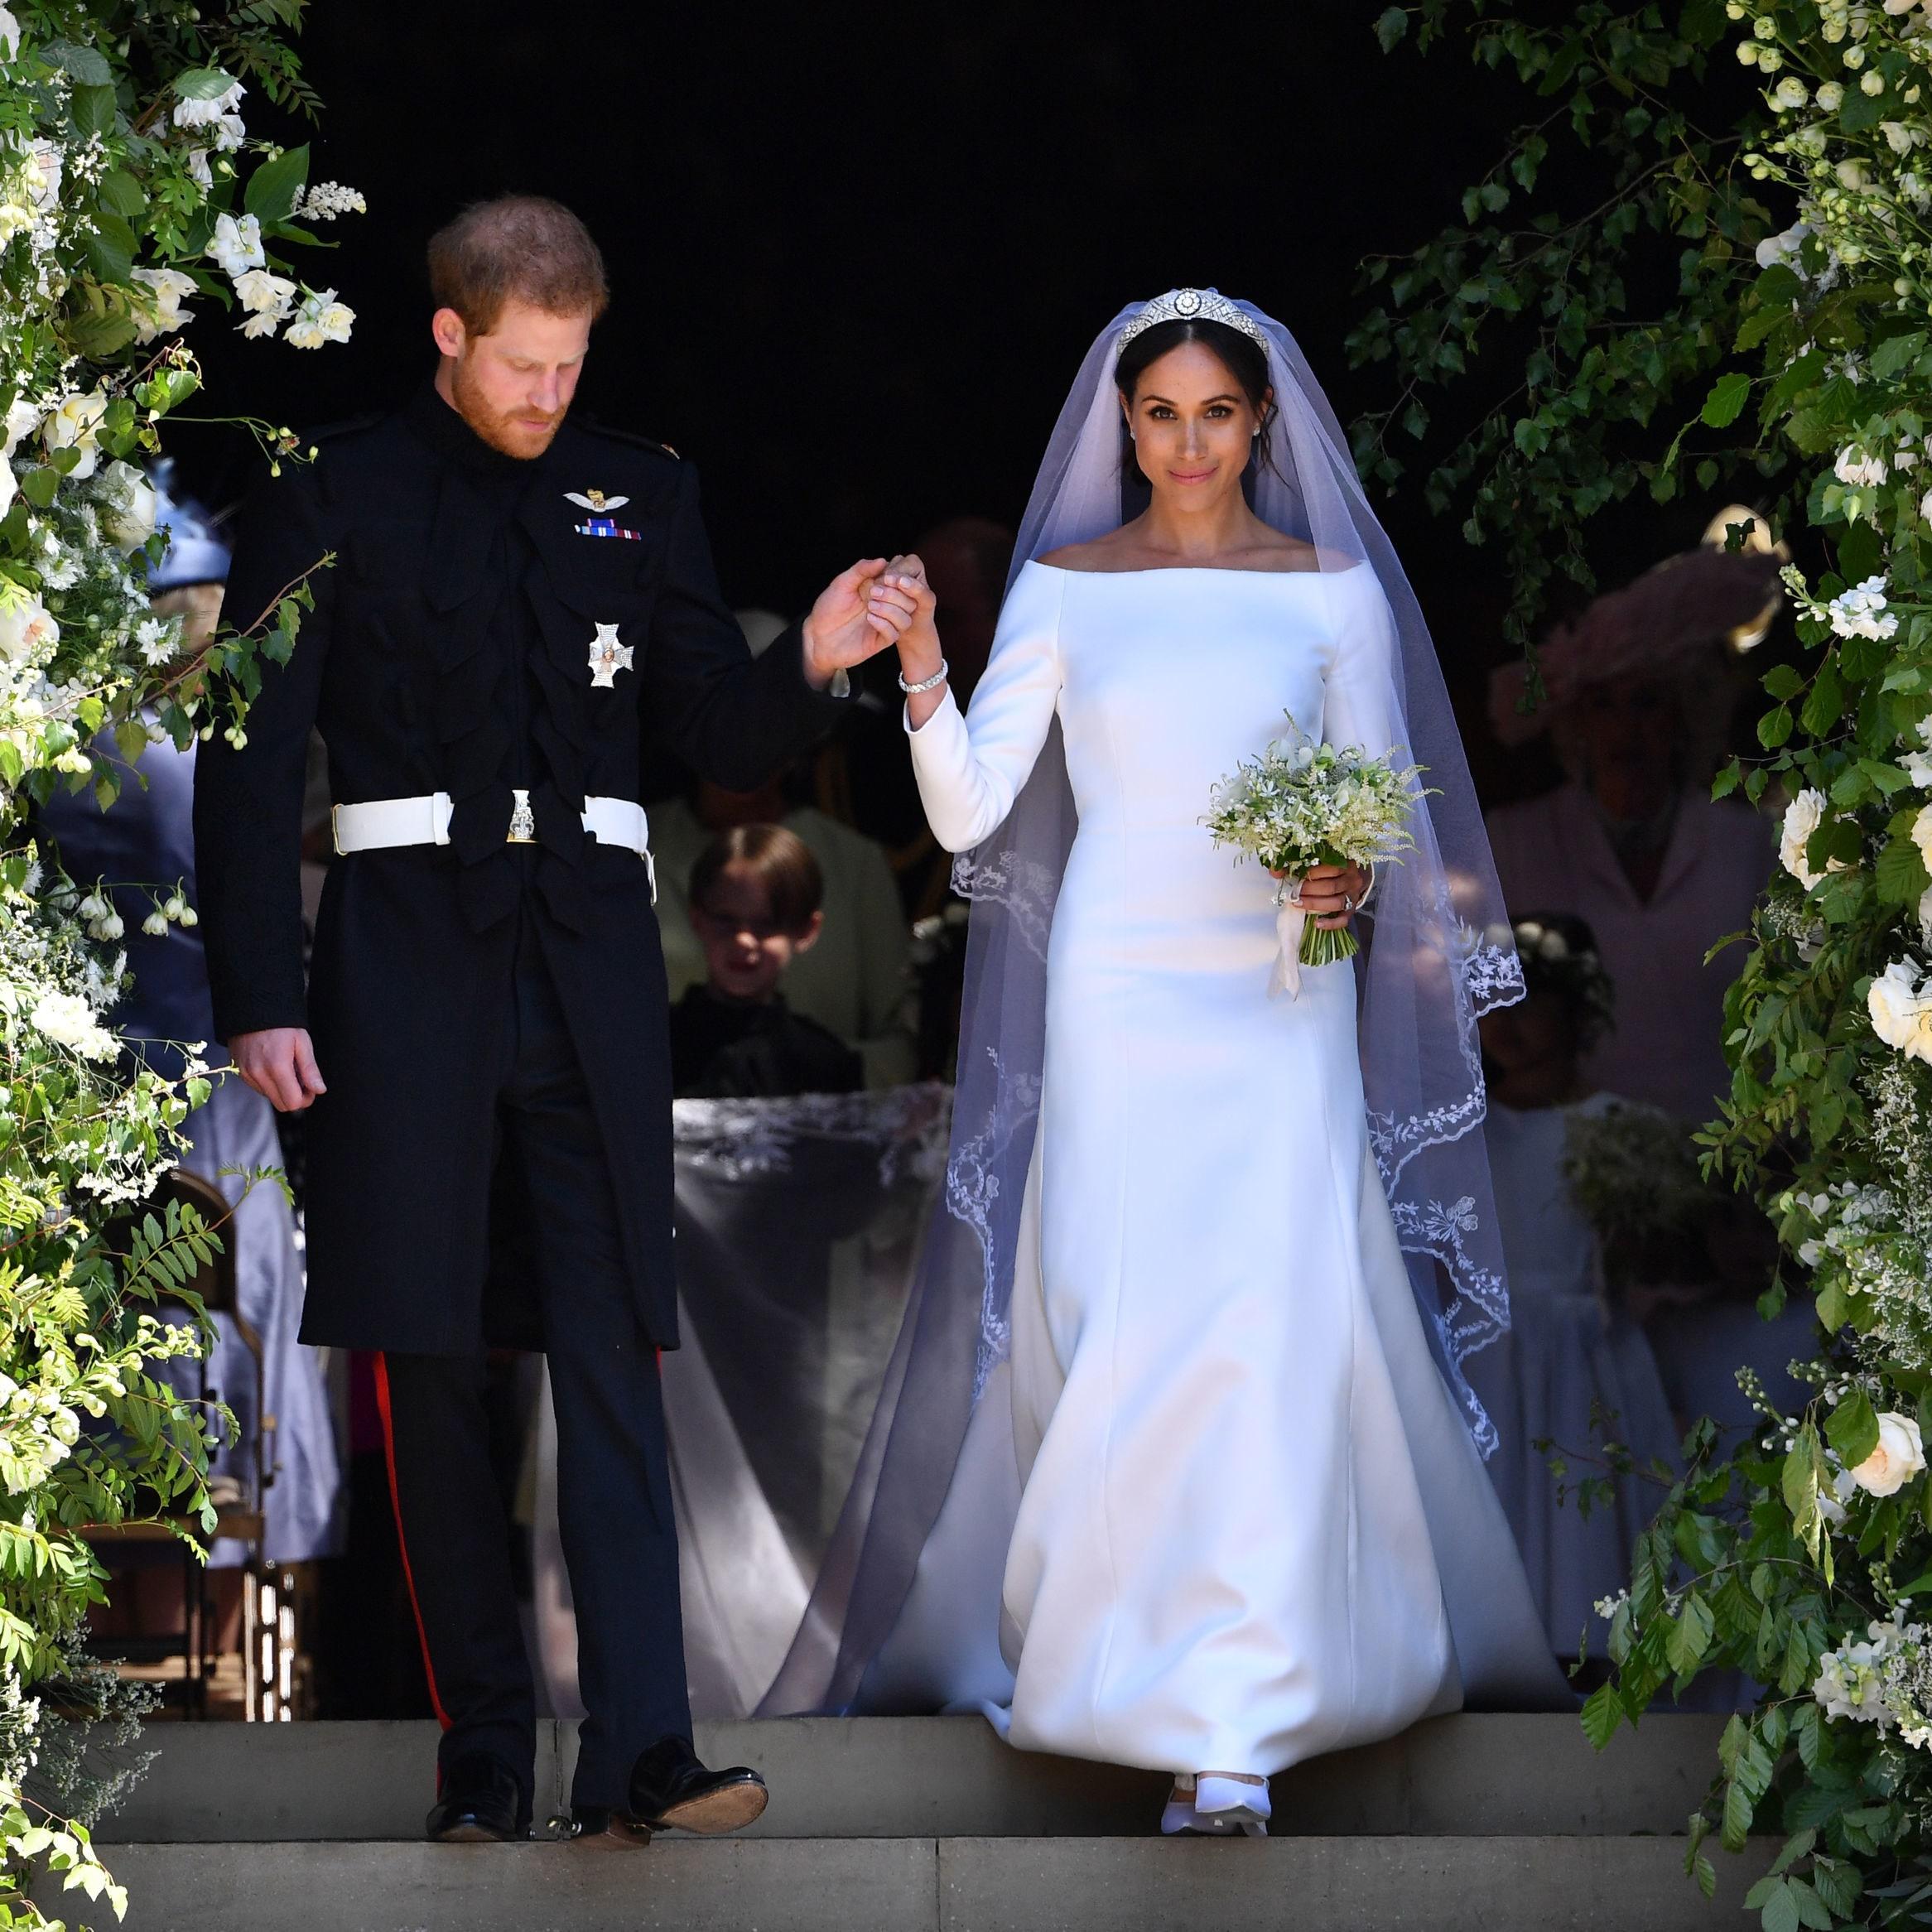 meghan markle váy cưới tối giản